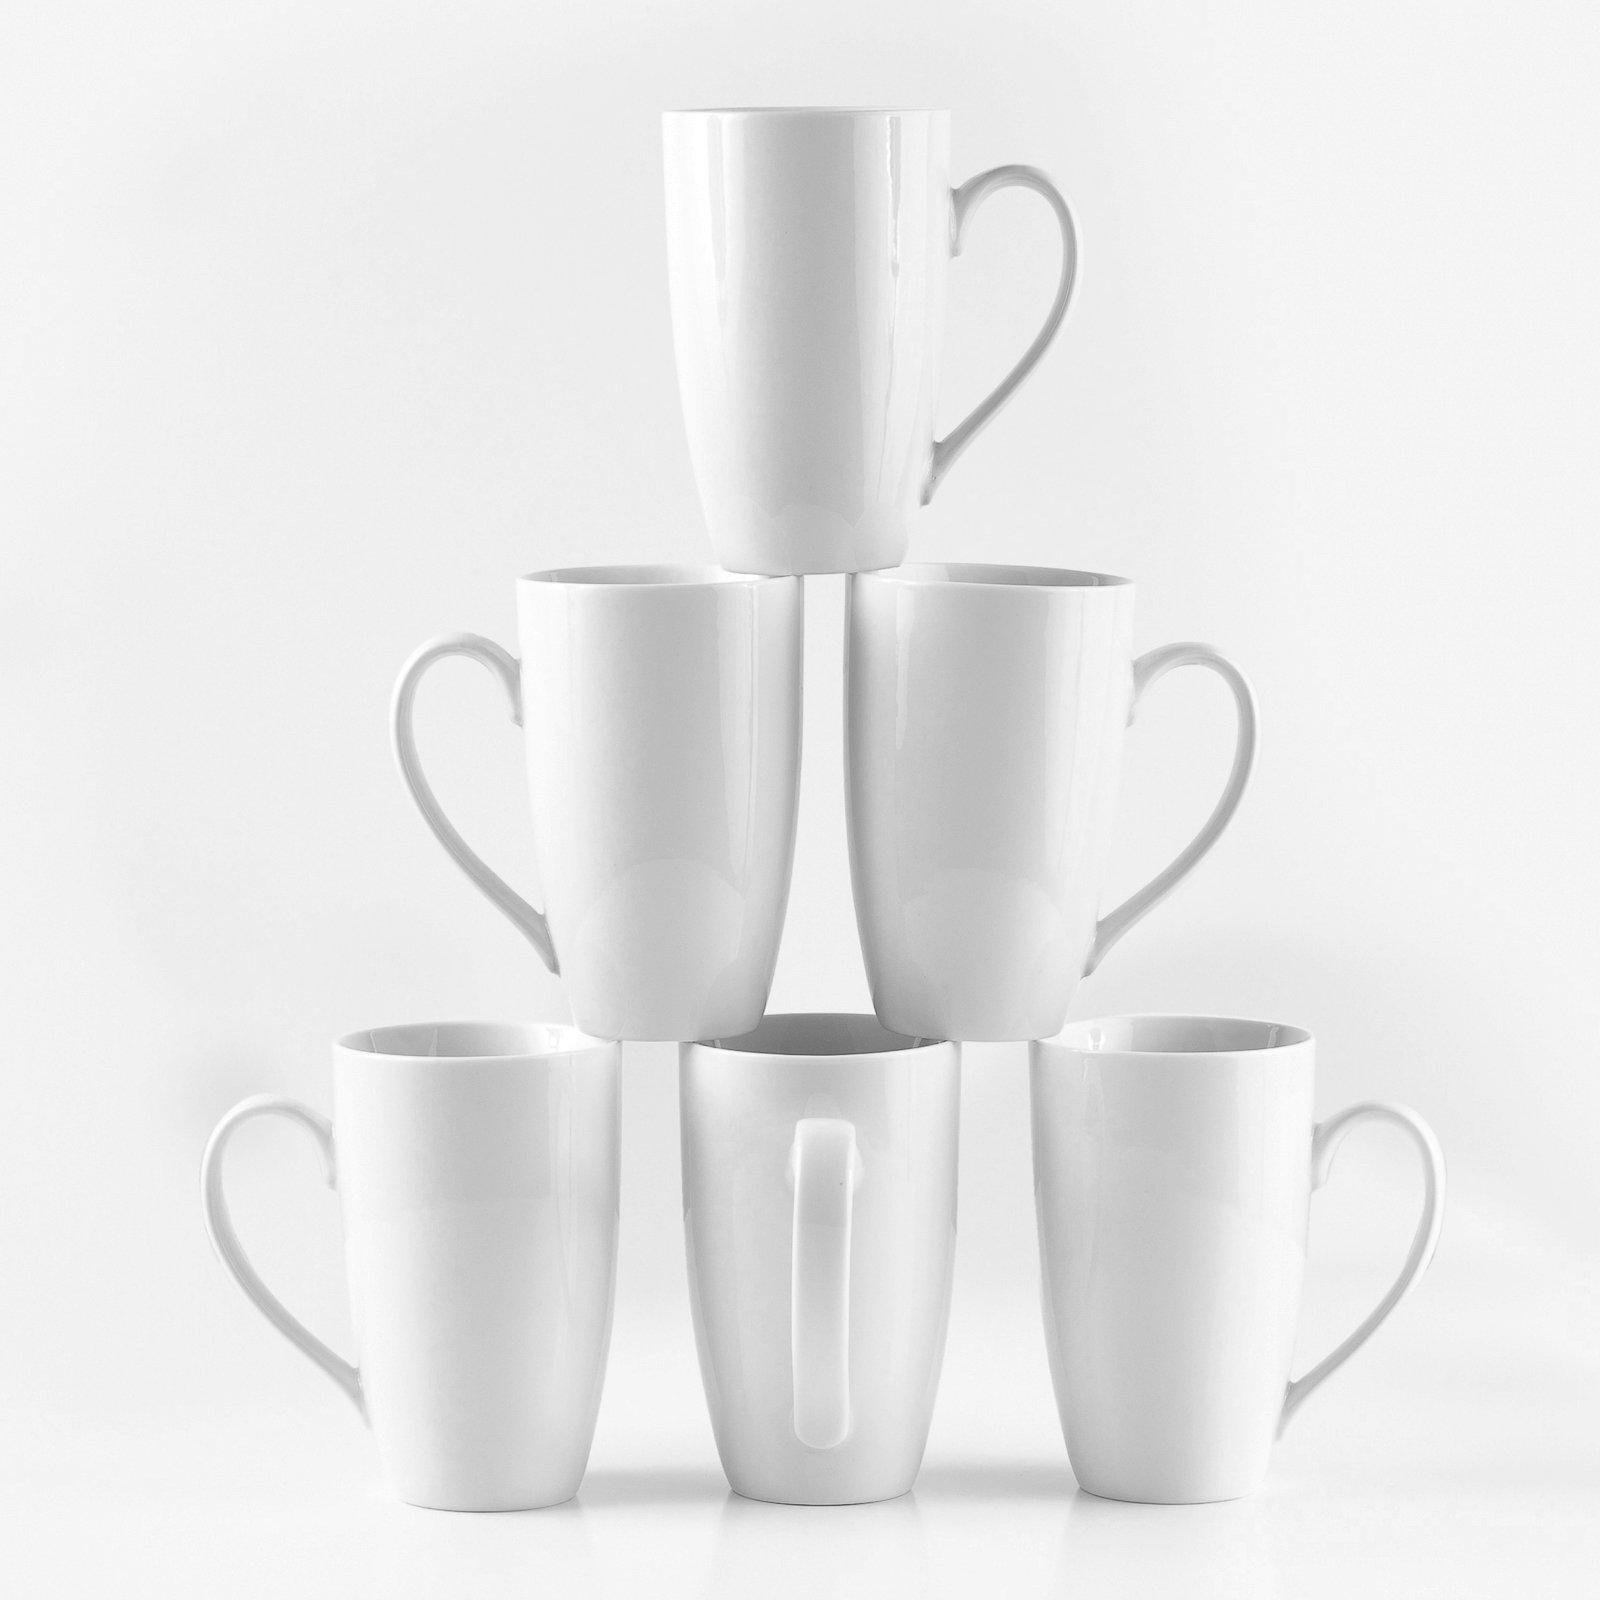 Amuse- Professional Barista Large Cozy Tall Mug- Set of 6-16 oz.